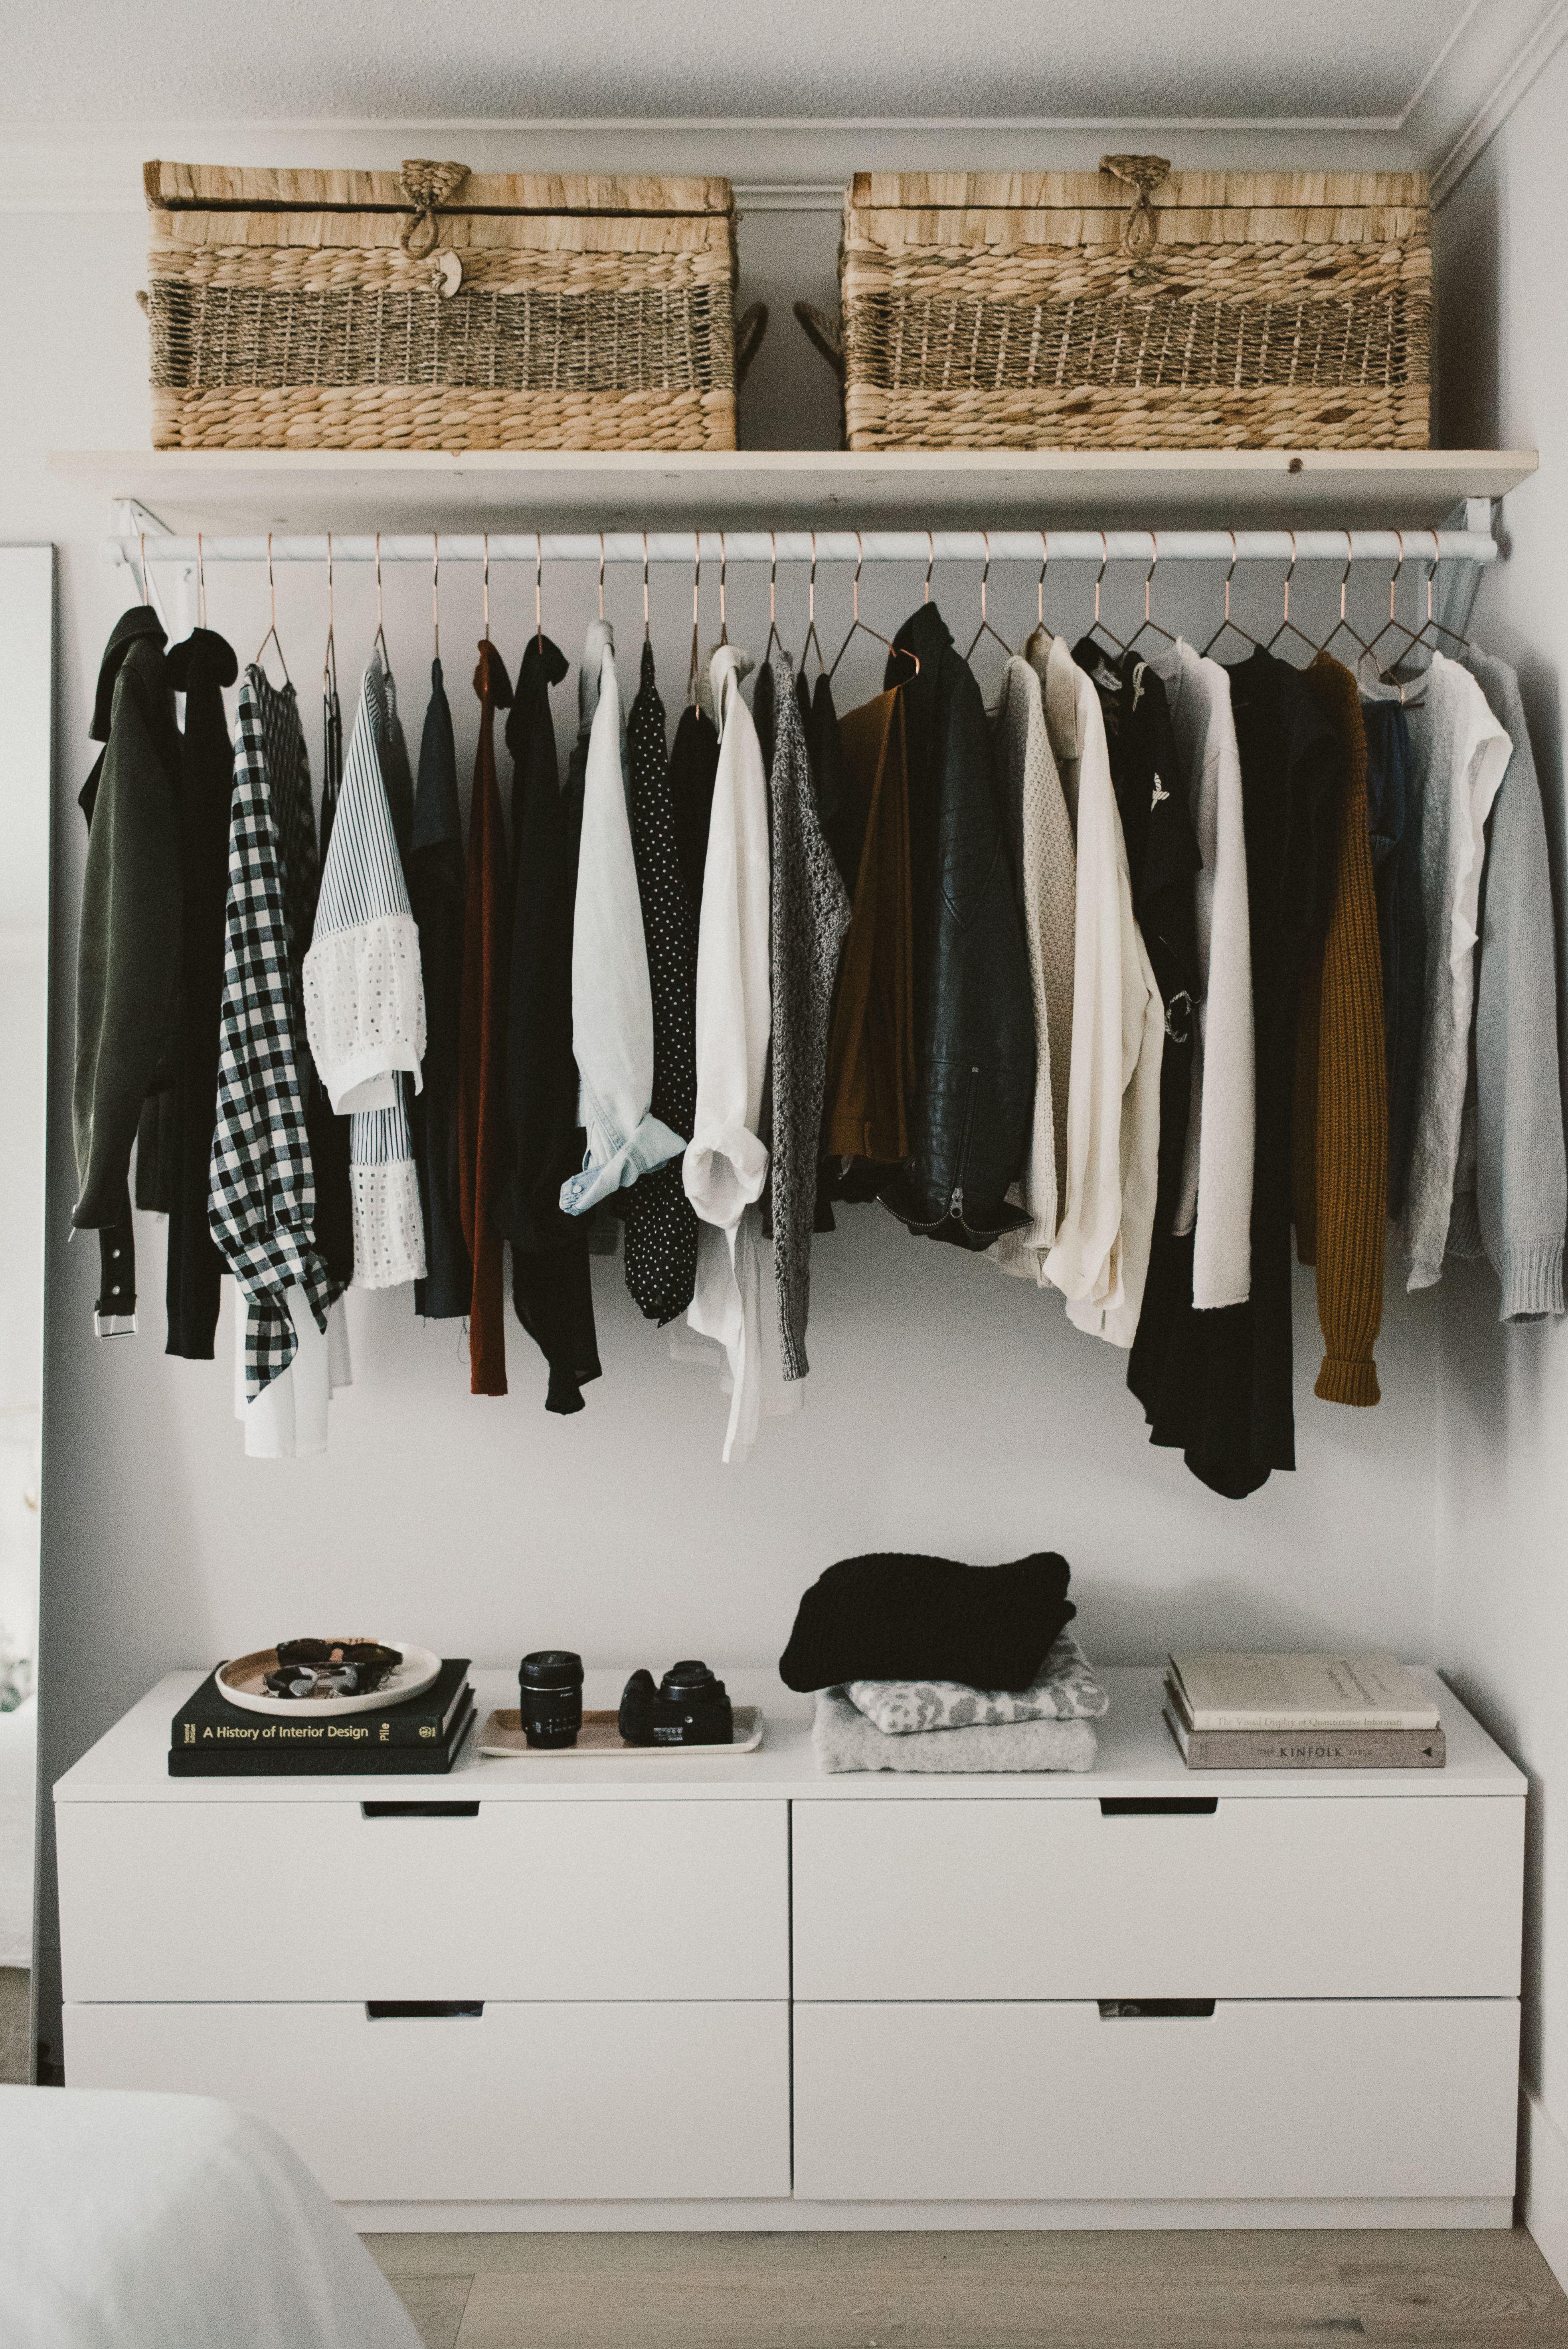 Diy Open Concept Closet Bedroom Organization Closet Closet Concepts Small Bedroom Decor